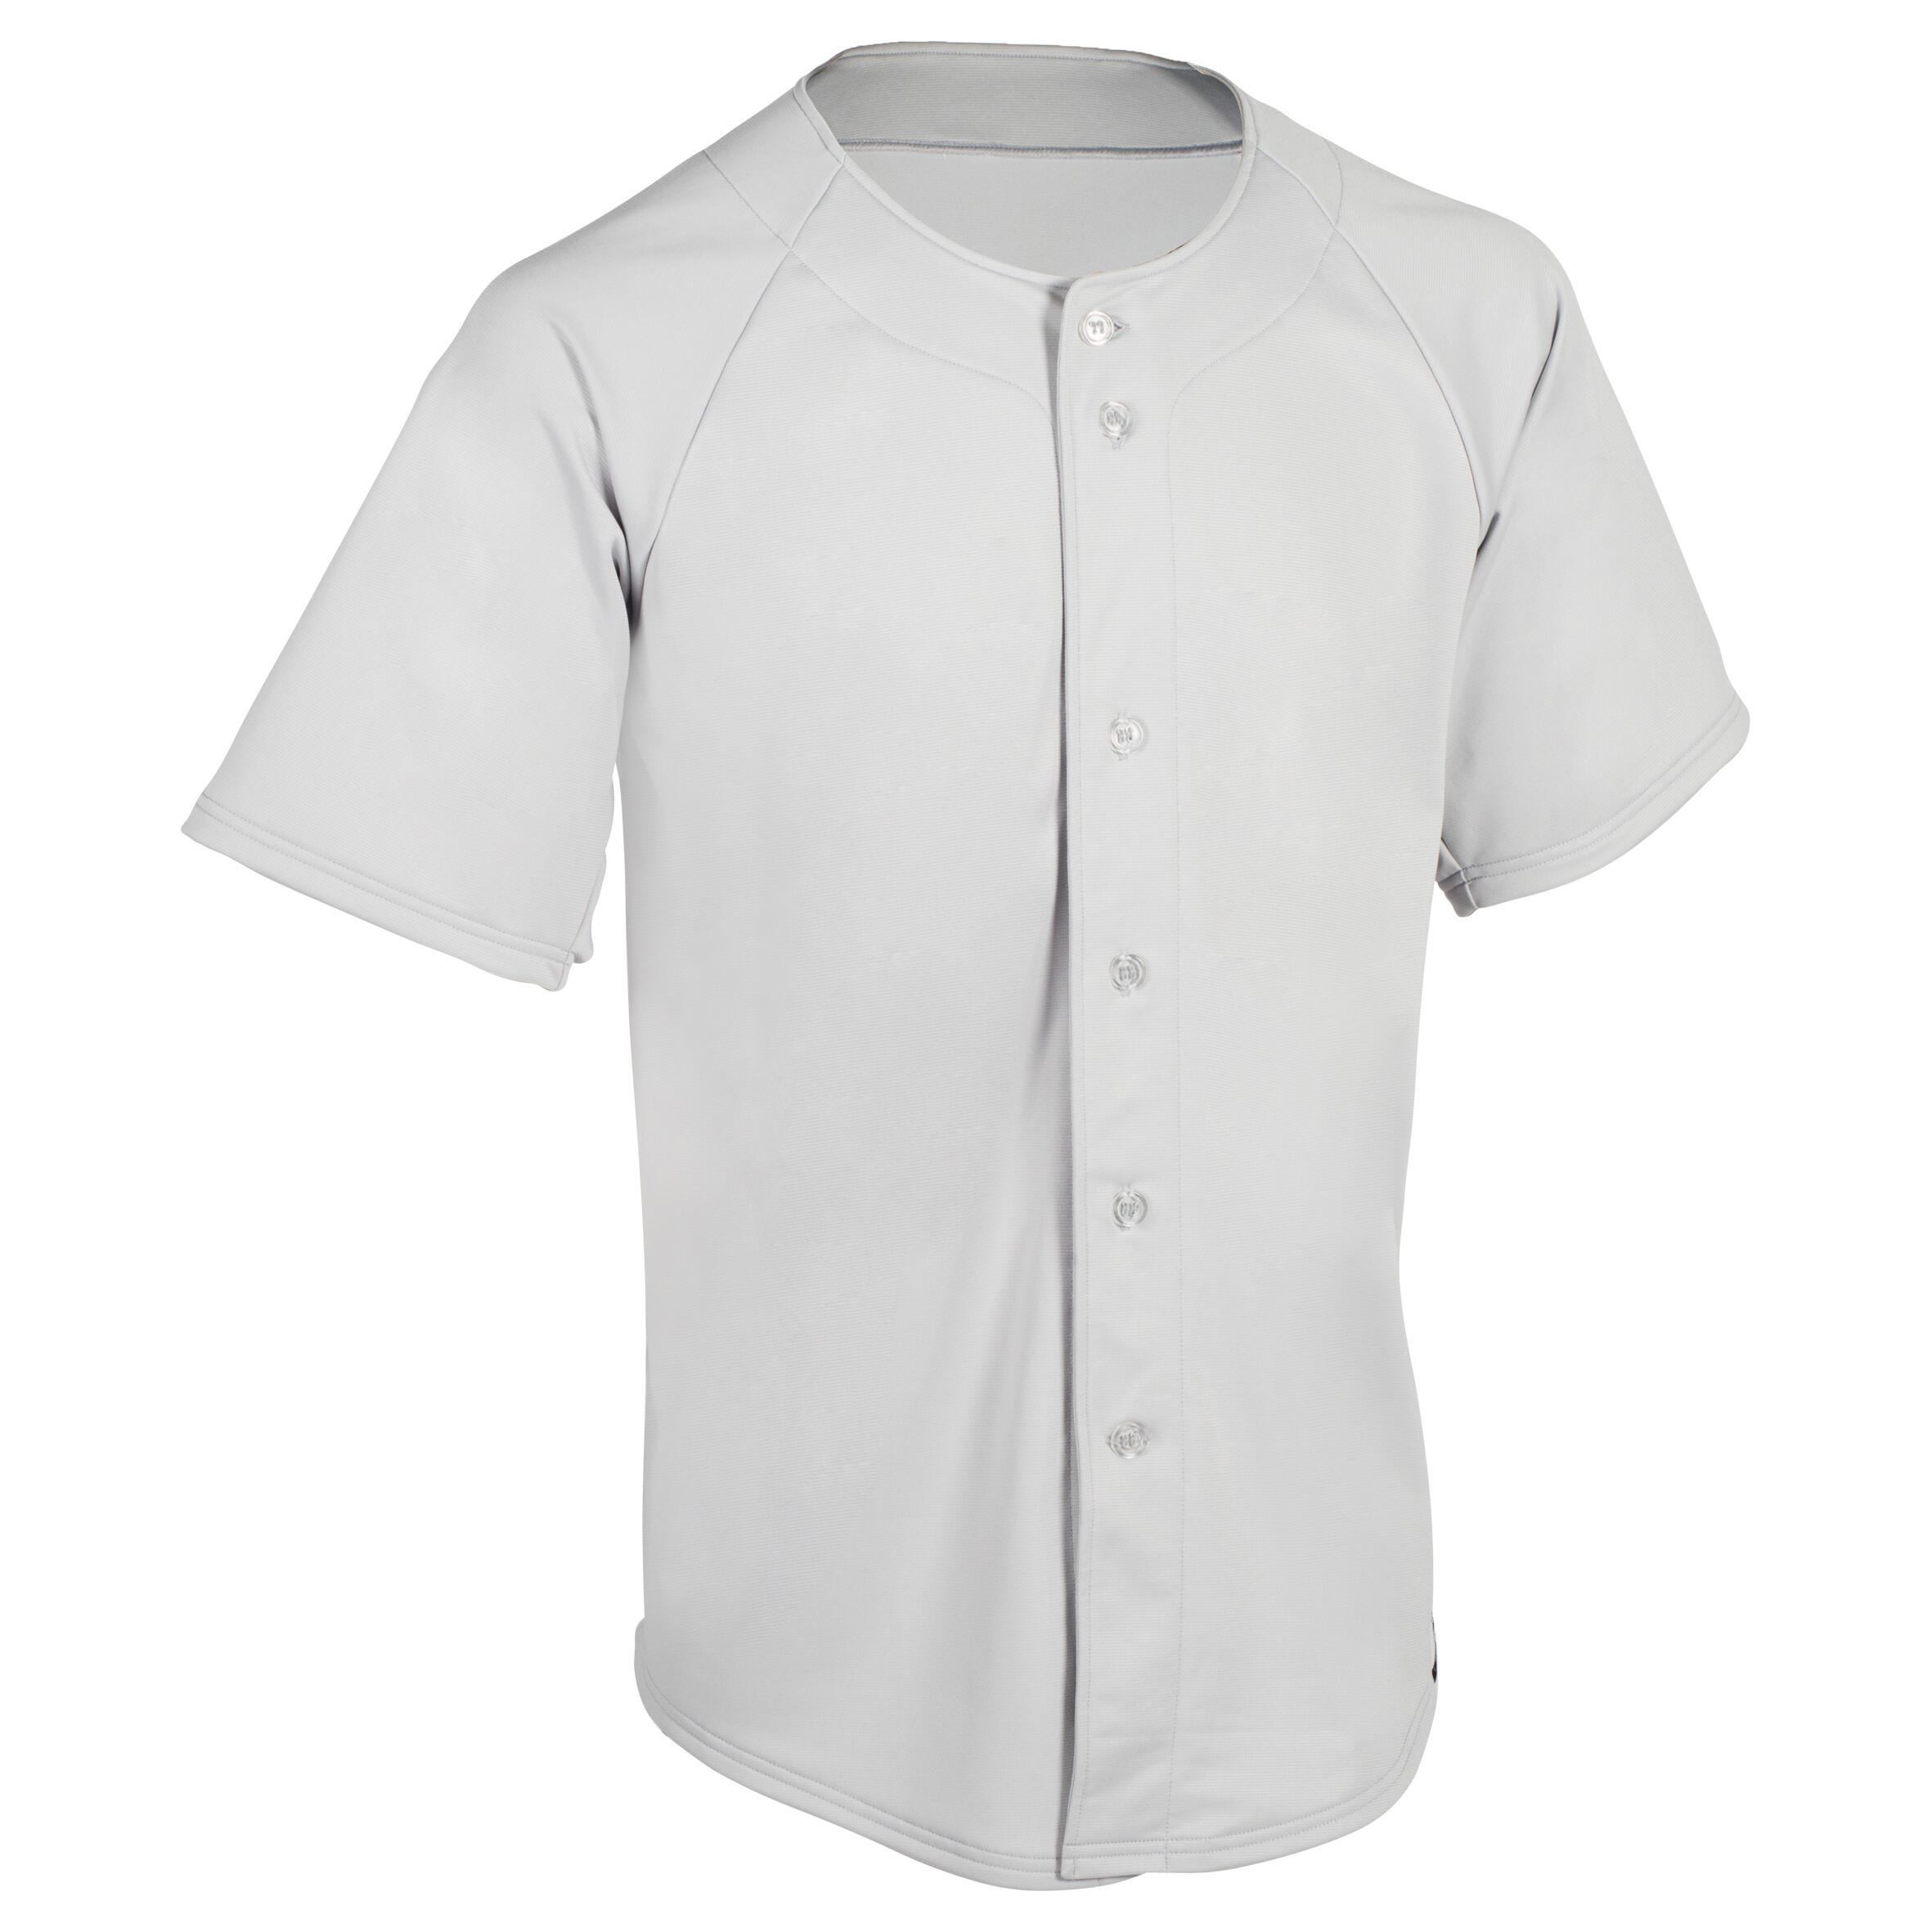 Baseballtrikot BA 550 Erwachsene | Sportbekleidung > Trikots | Kipsta